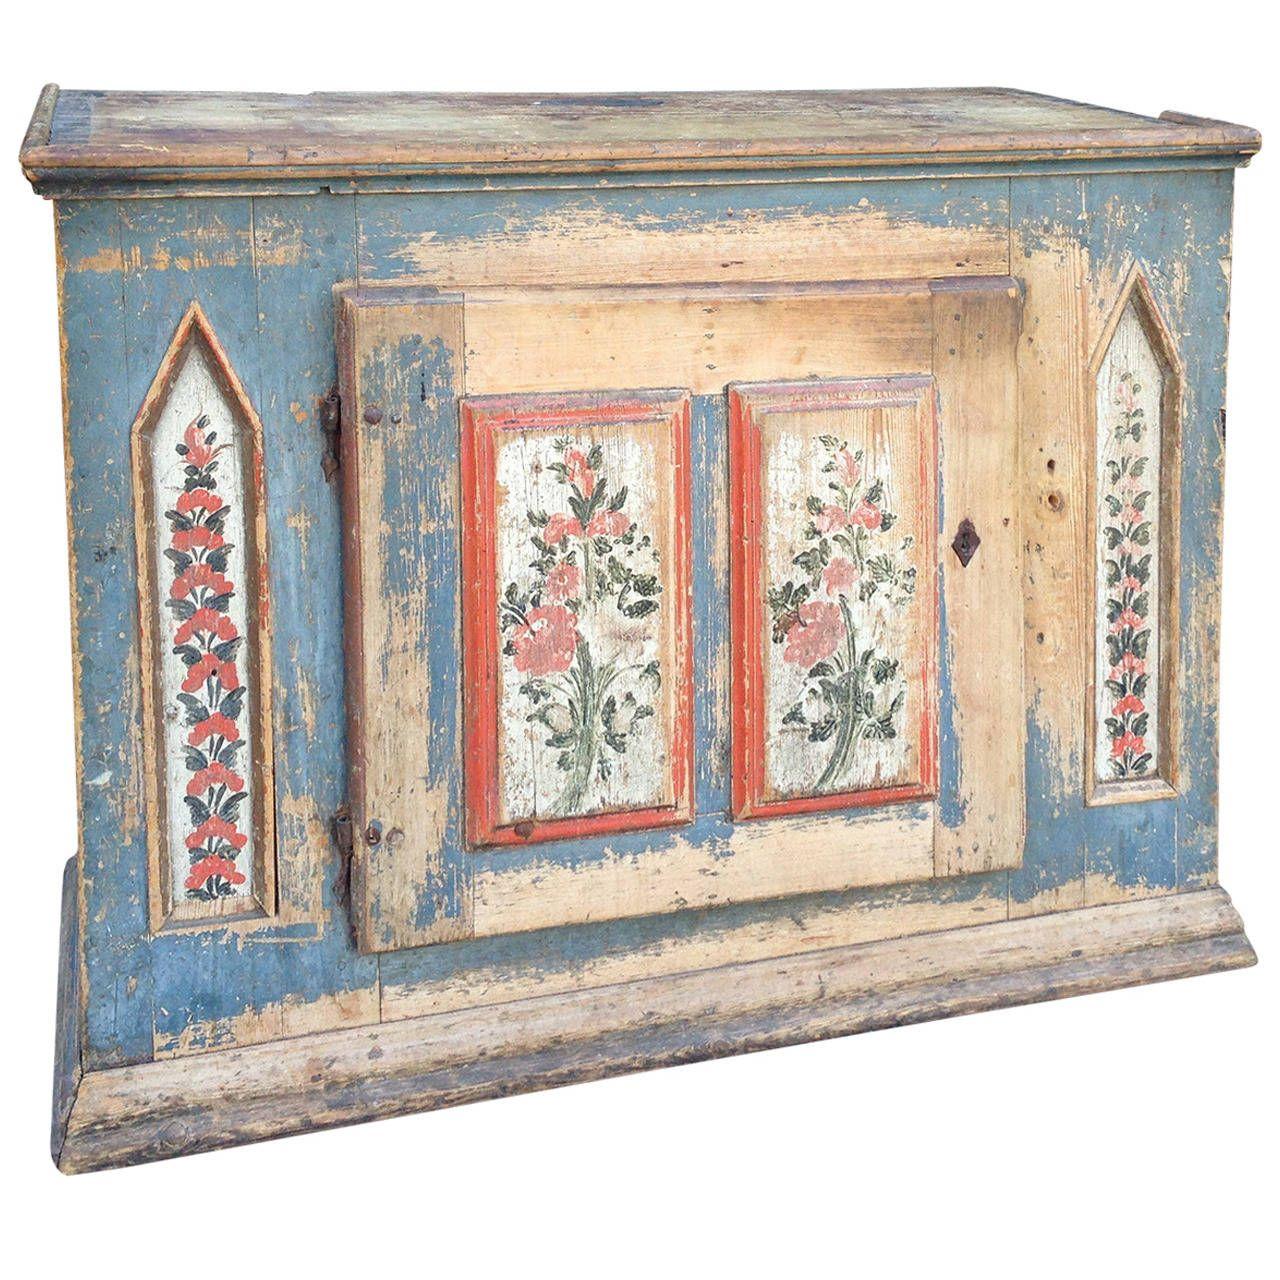 1850 Swedish Painted Cupboard 1stdibs Com Antique Paint Distressed Wood Furniture Scandinavian Style Furniture